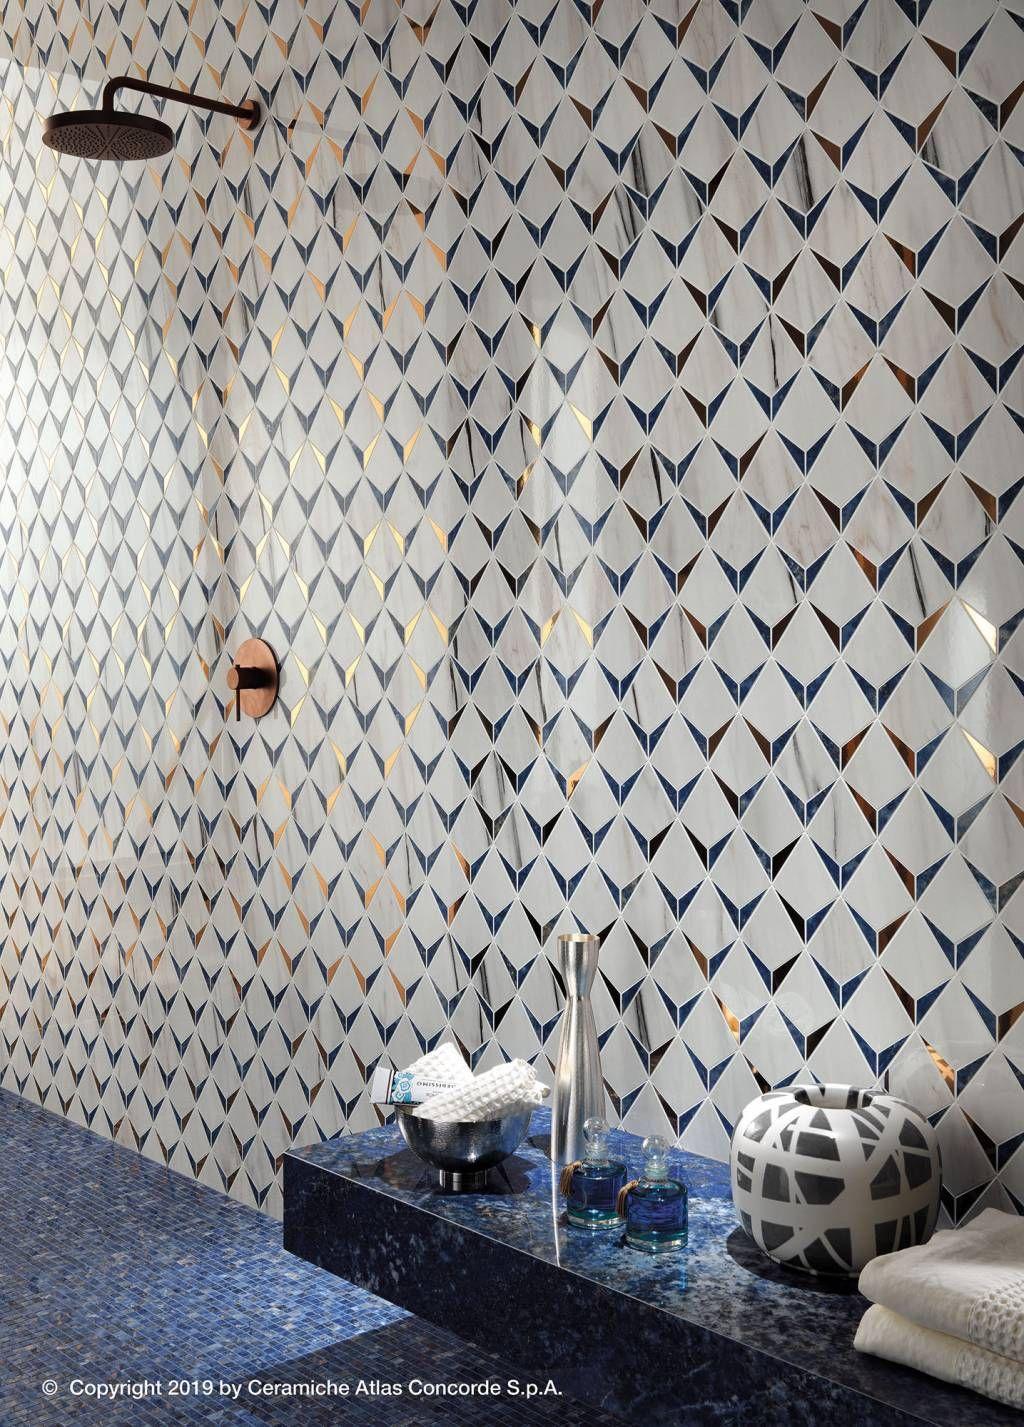 Marvel Dream Ultramarine Bathroom Tile Inspiration Marble Wall Tiles Marble Effect